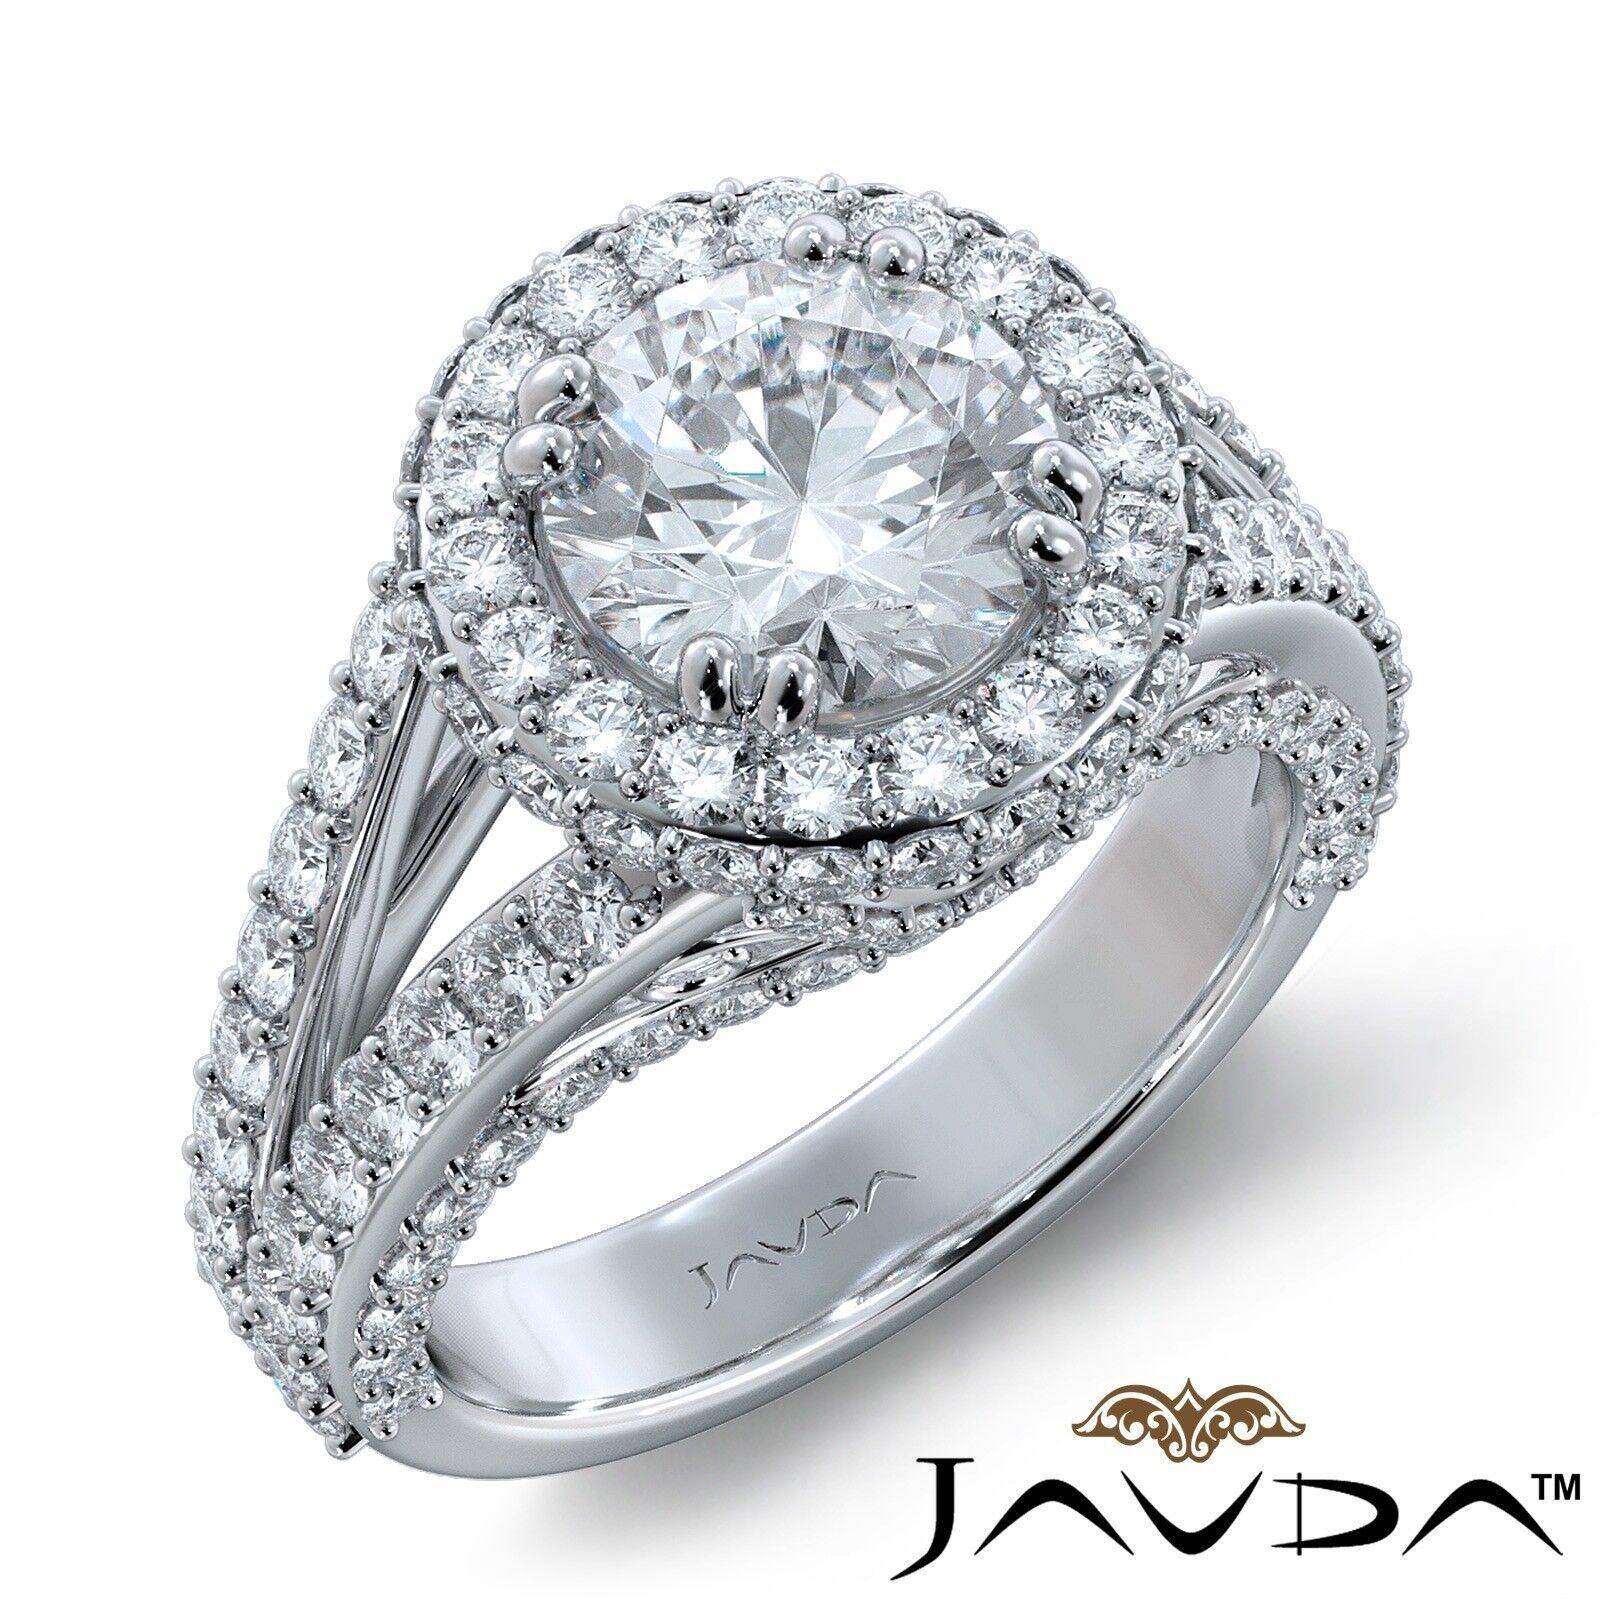 4.2ctw Pave Set Halo Vintage Round Diamond Engagement Ring GIA H-VS1 White Gold